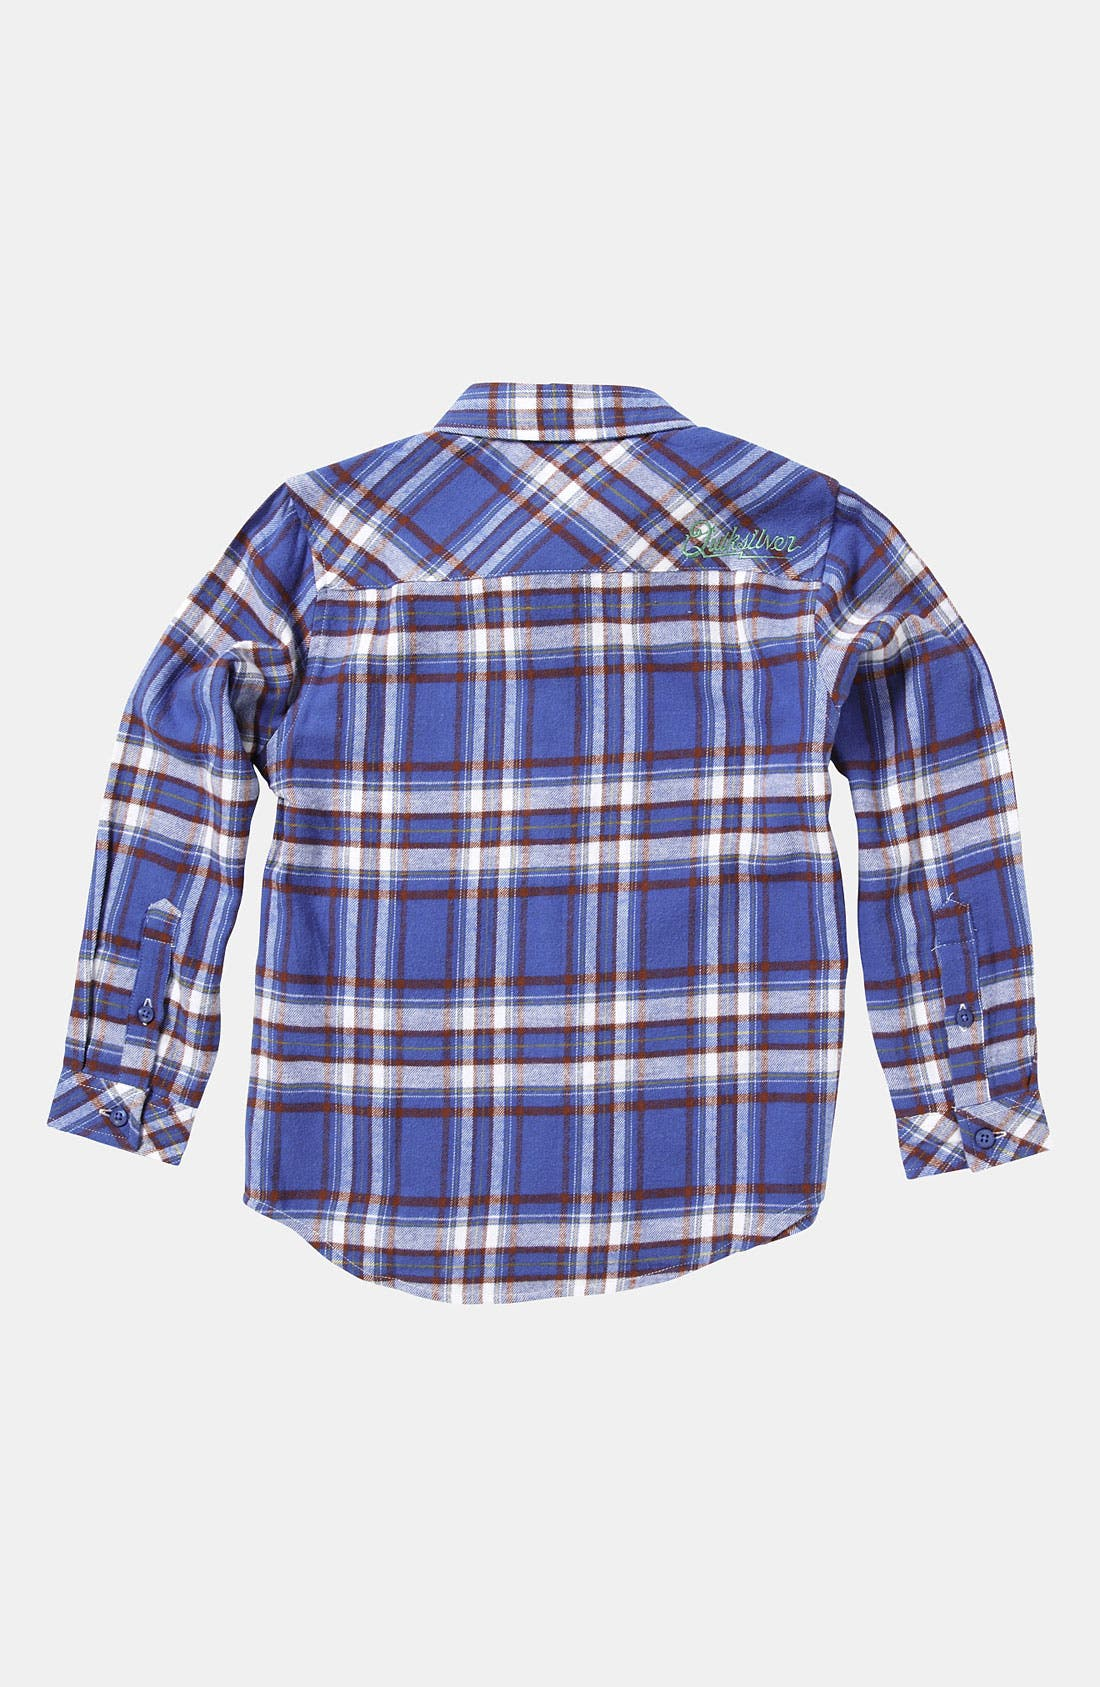 Alternate Image 2  - Quiksilver 'Bunga Bunga' Woven Shirt (Little Boys)